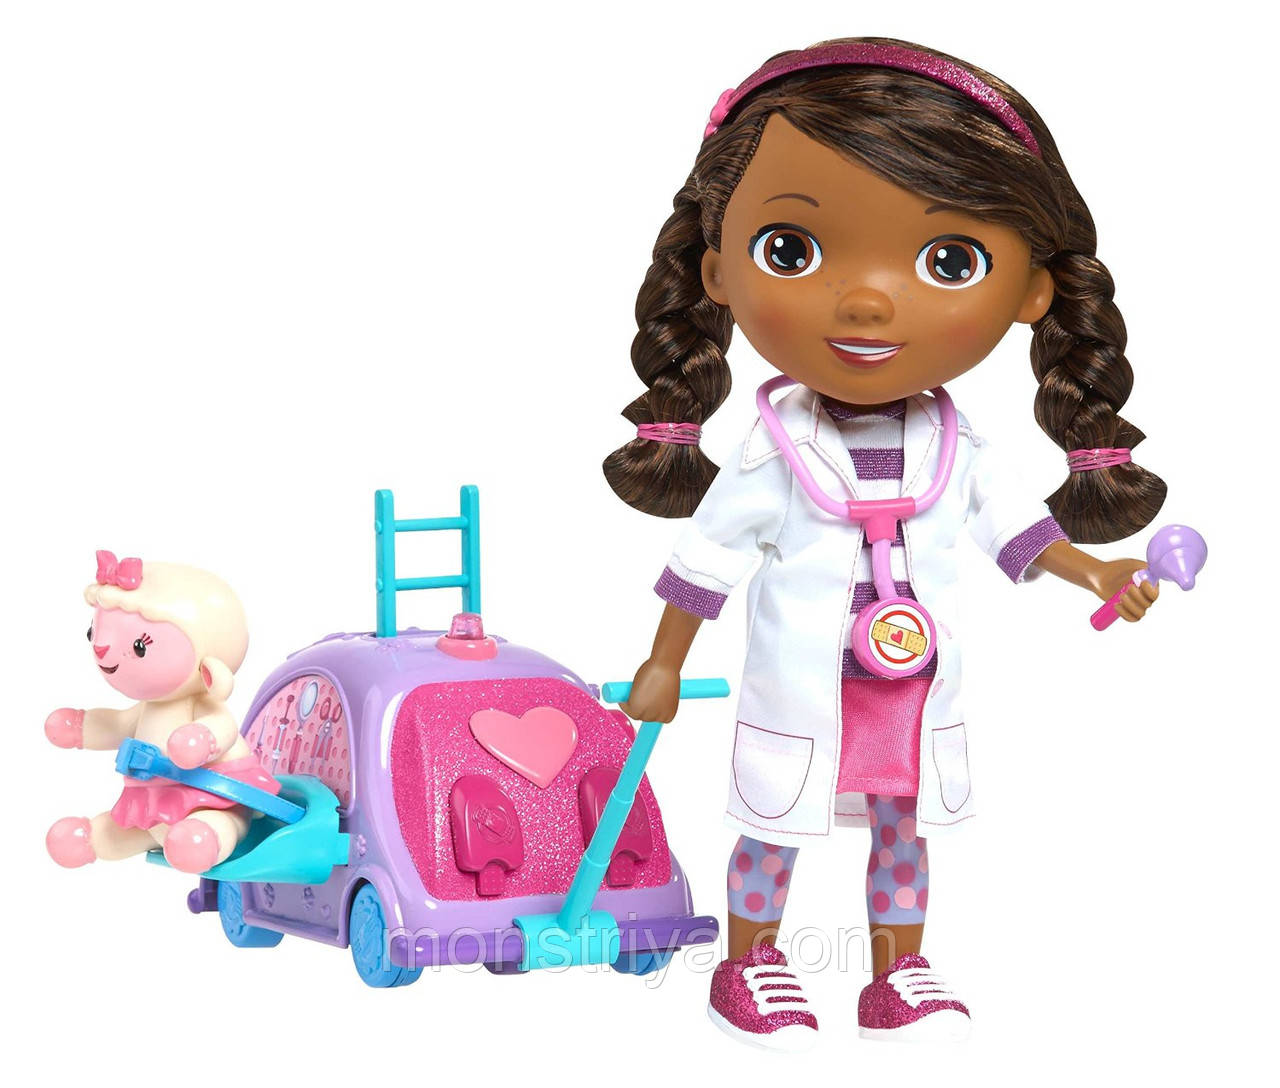 Кукла интерактивная  доктор Плюшева Doc McStuffins, фото 1